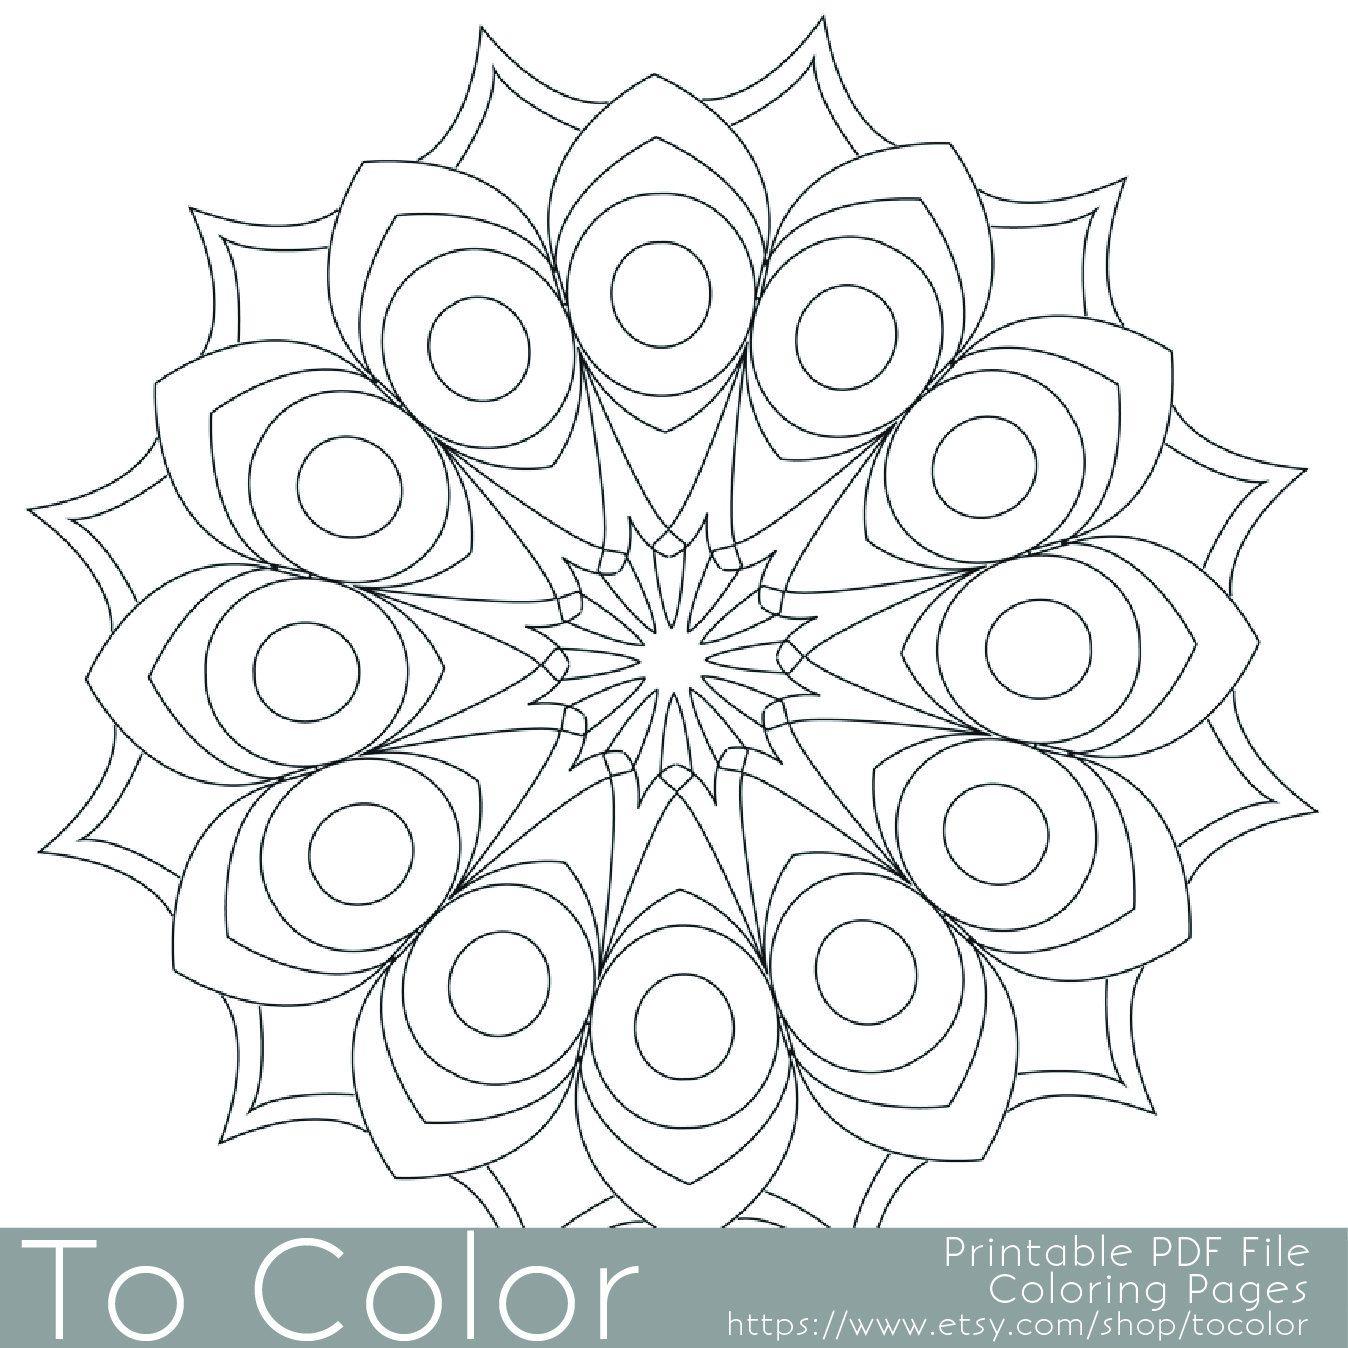 Printable Circular Mandala Easy Coloring Pages for Adults